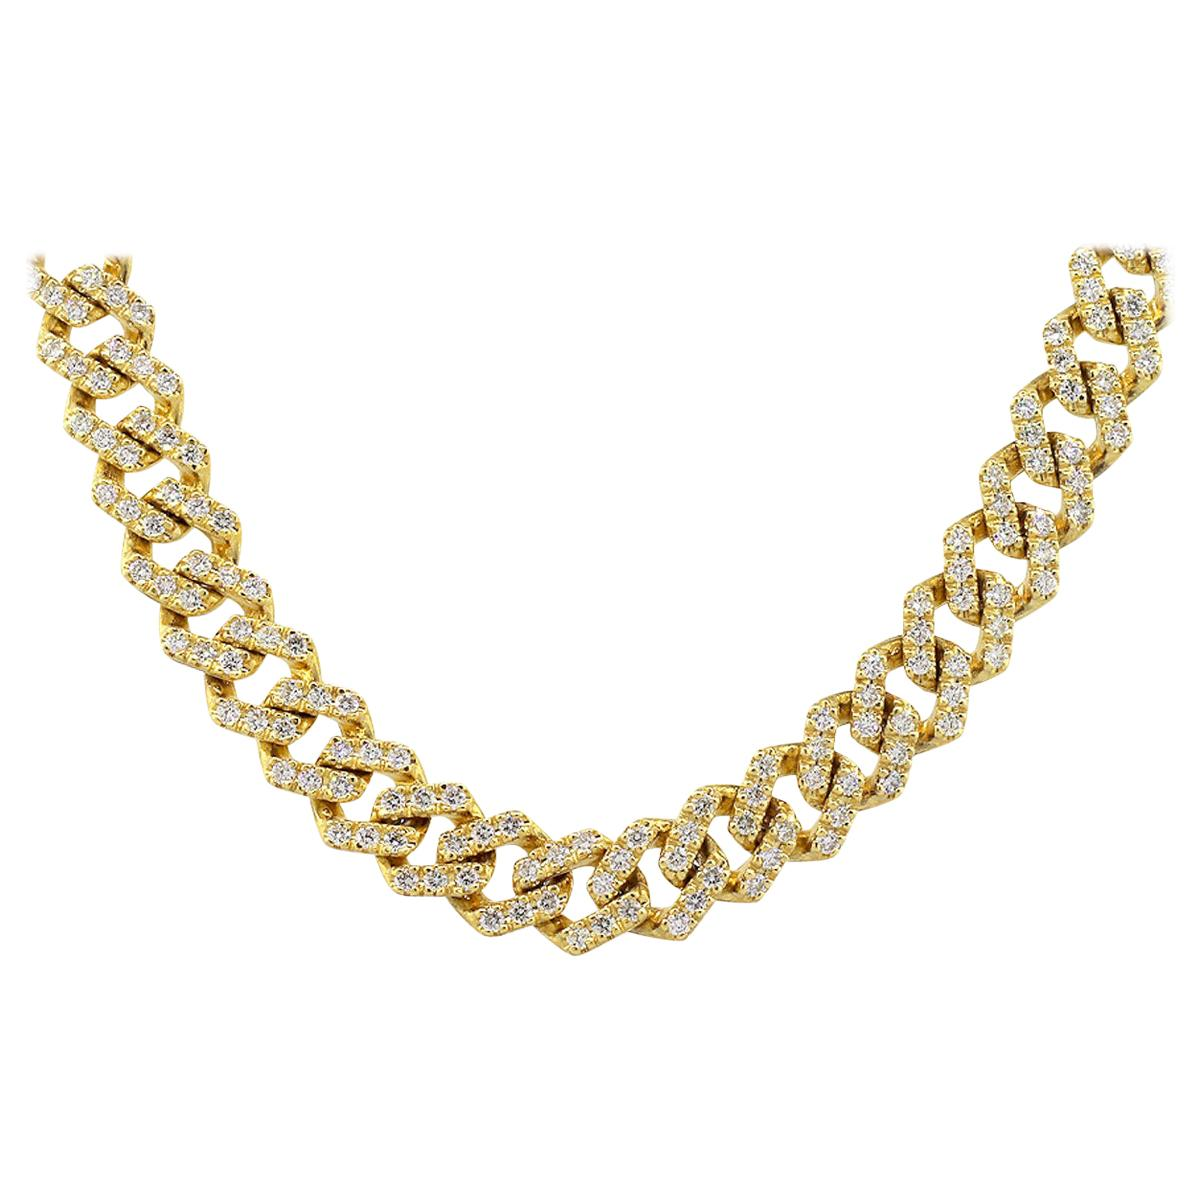 14.83 Carat Round Diamond Pave Cuban Link Chain Necklace 14 Karat